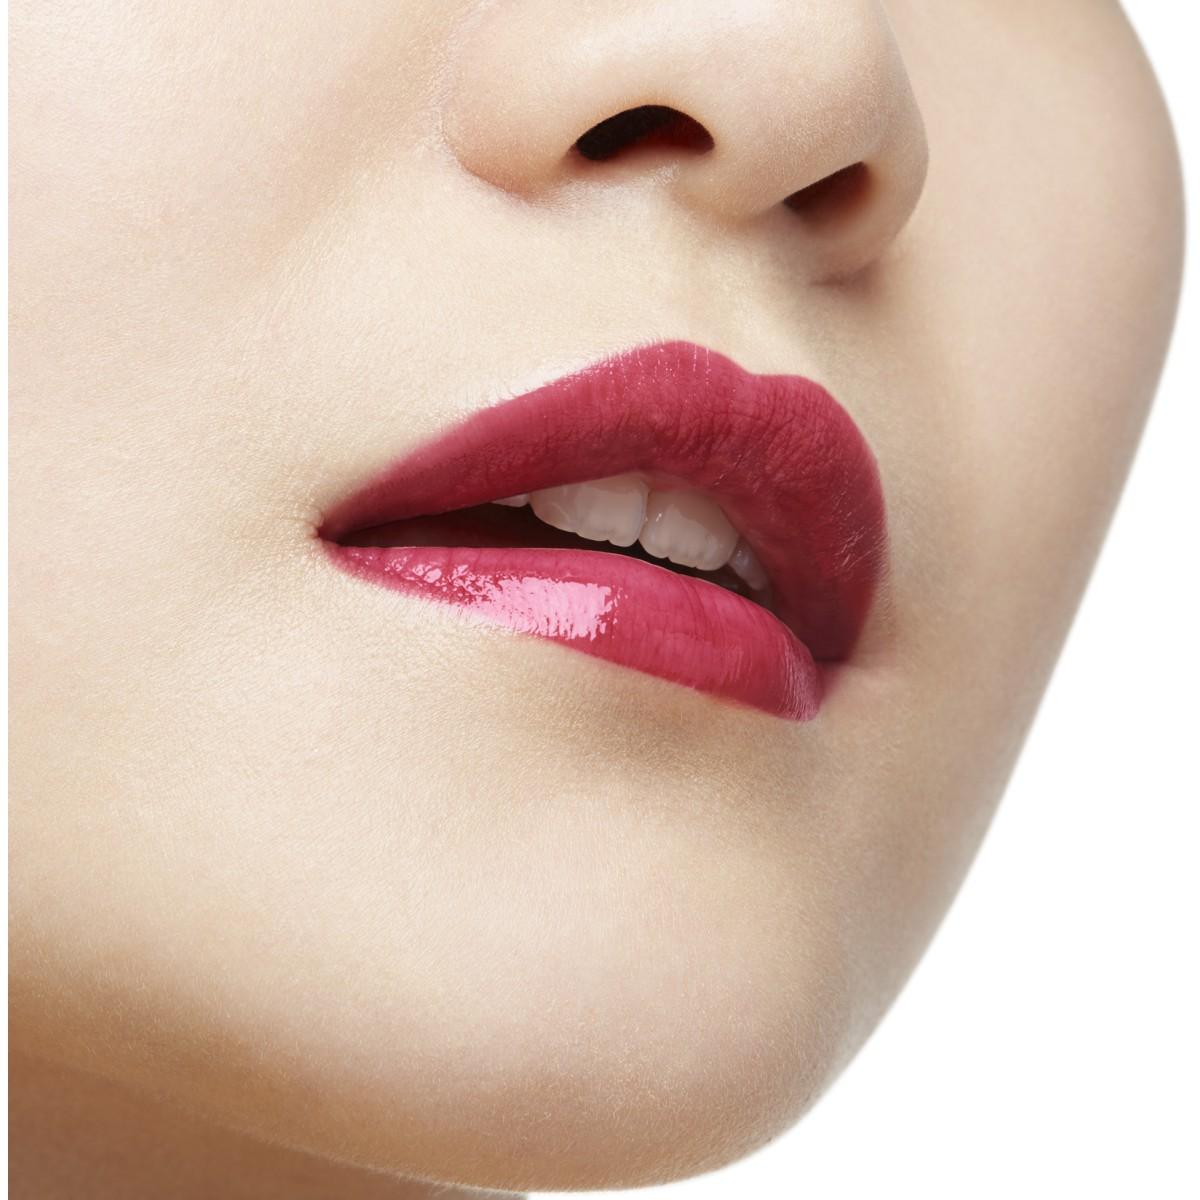 Woman Beauty - Loubibelle - Christian Louboutin